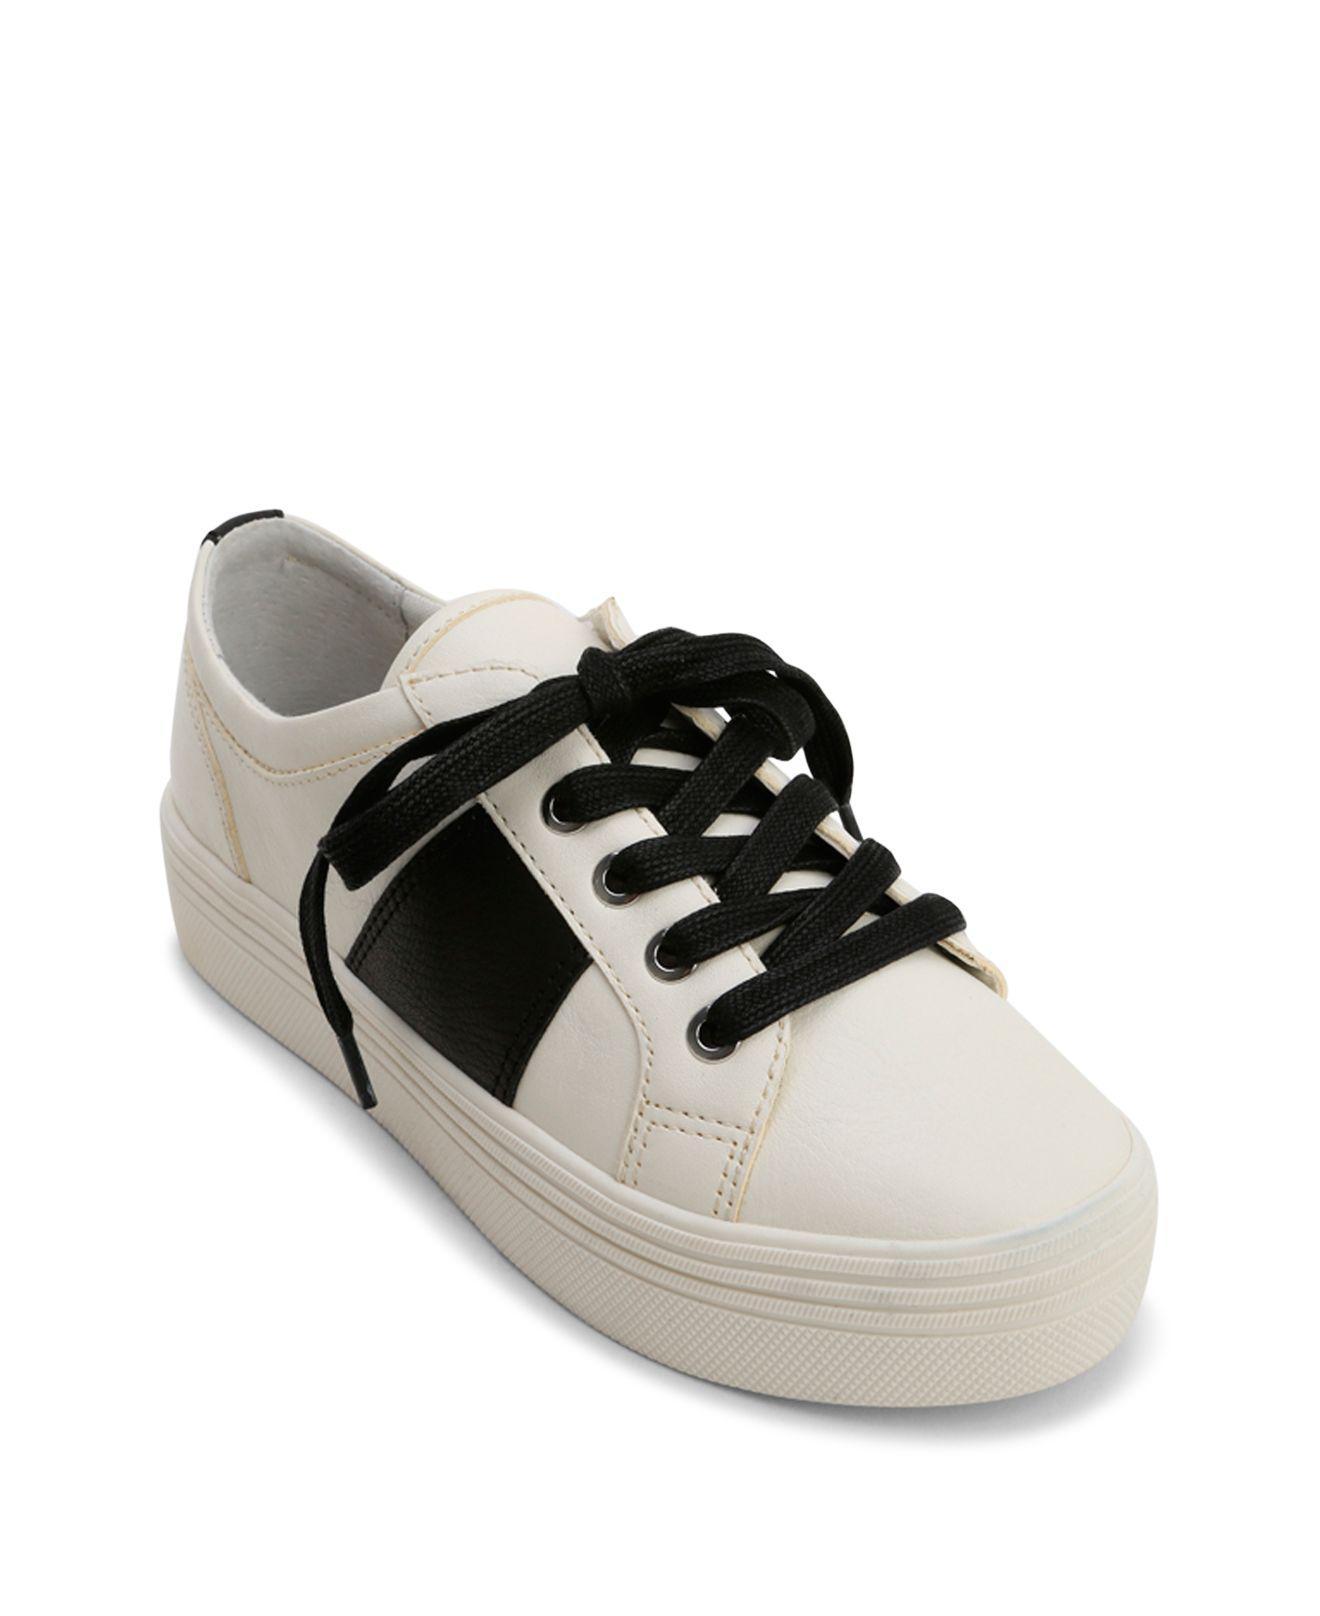 Dolce Vita Women's Tavina Leather Lace Up Platform Sneakers gWbXRwuk